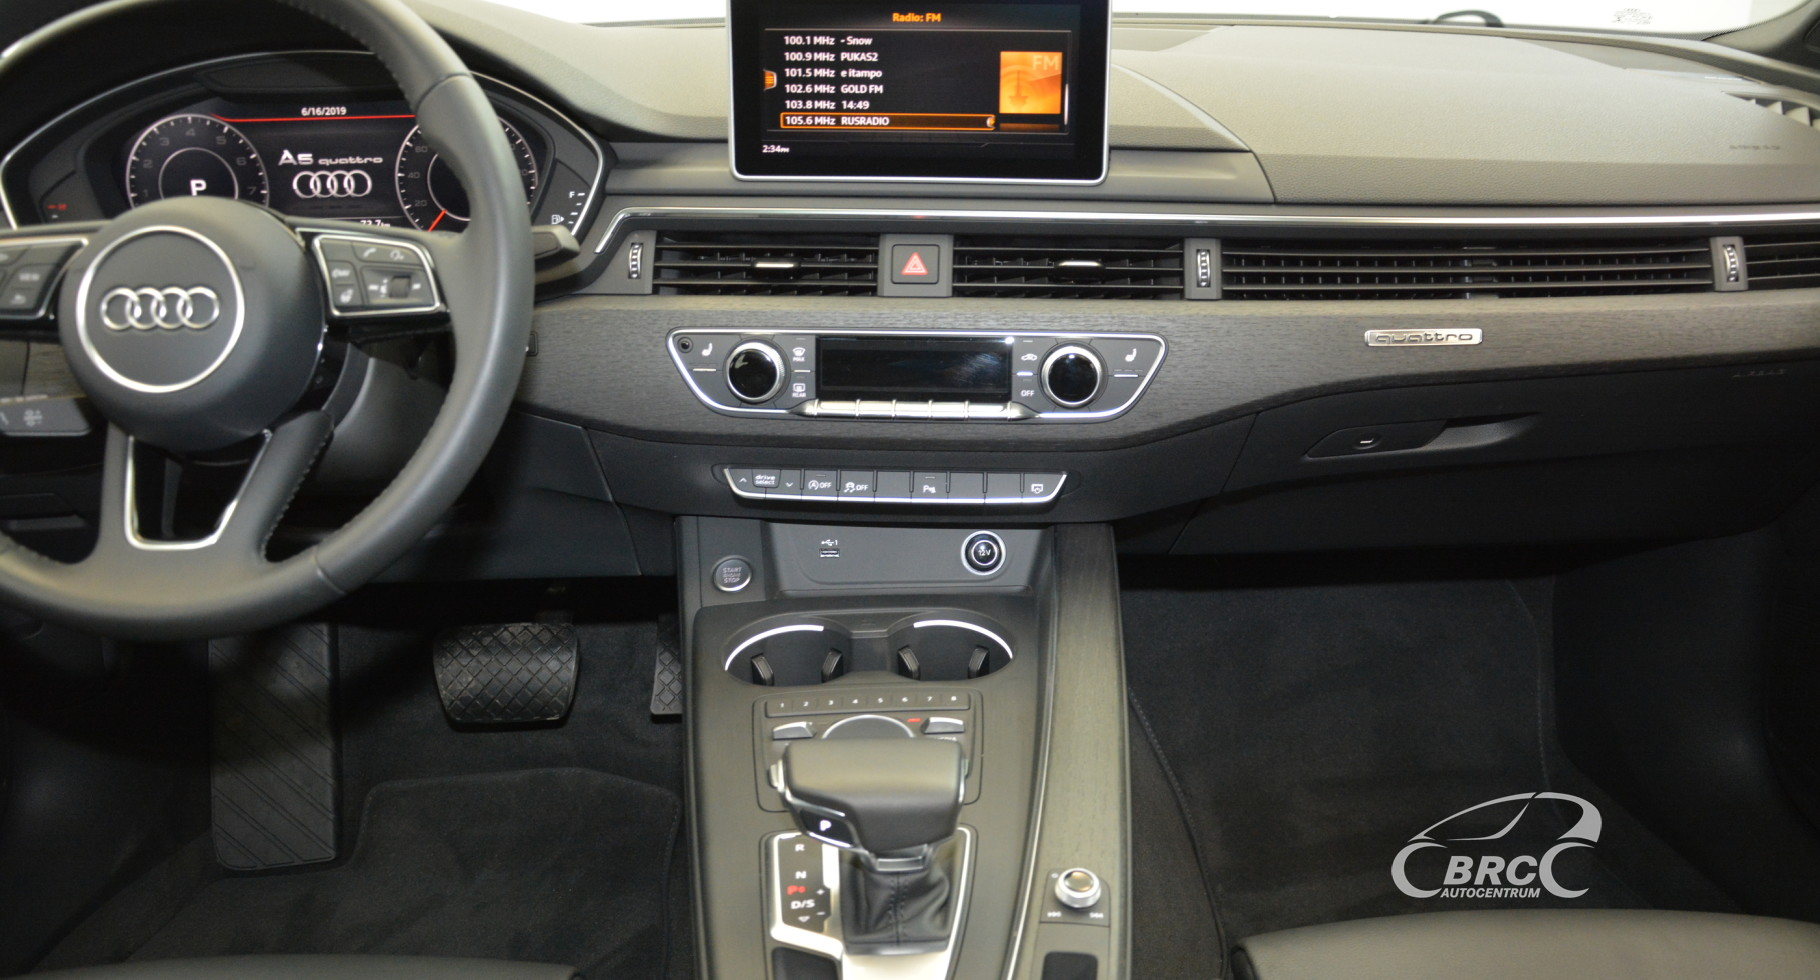 Audi A5 2 0 TFSI Quattro S-line Automatas